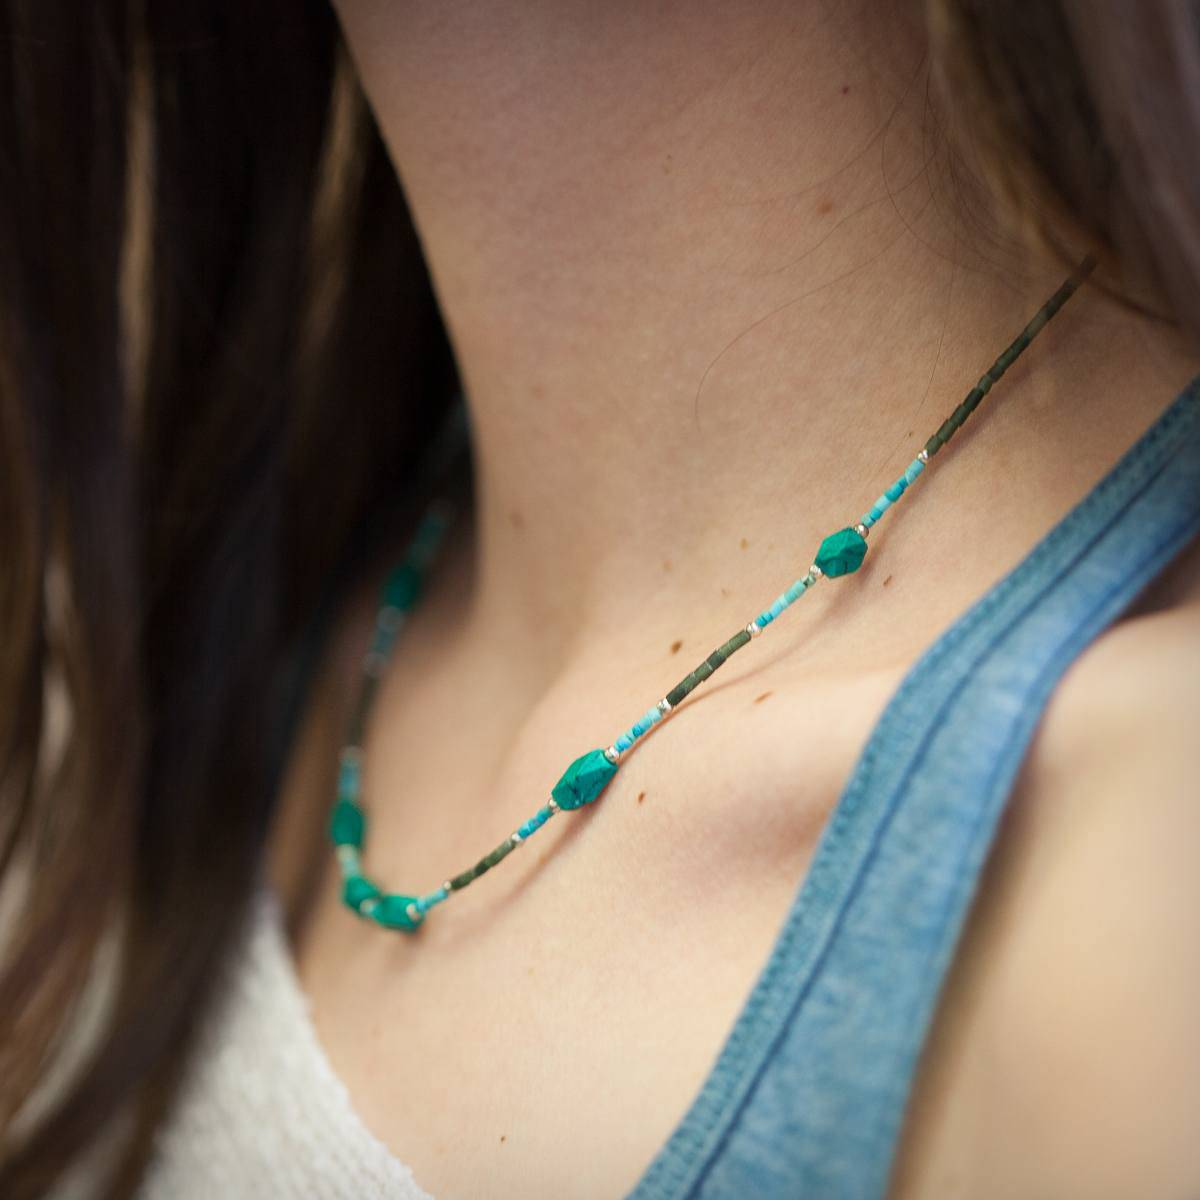 Wise Abundance Necklaces 4_1 Primary